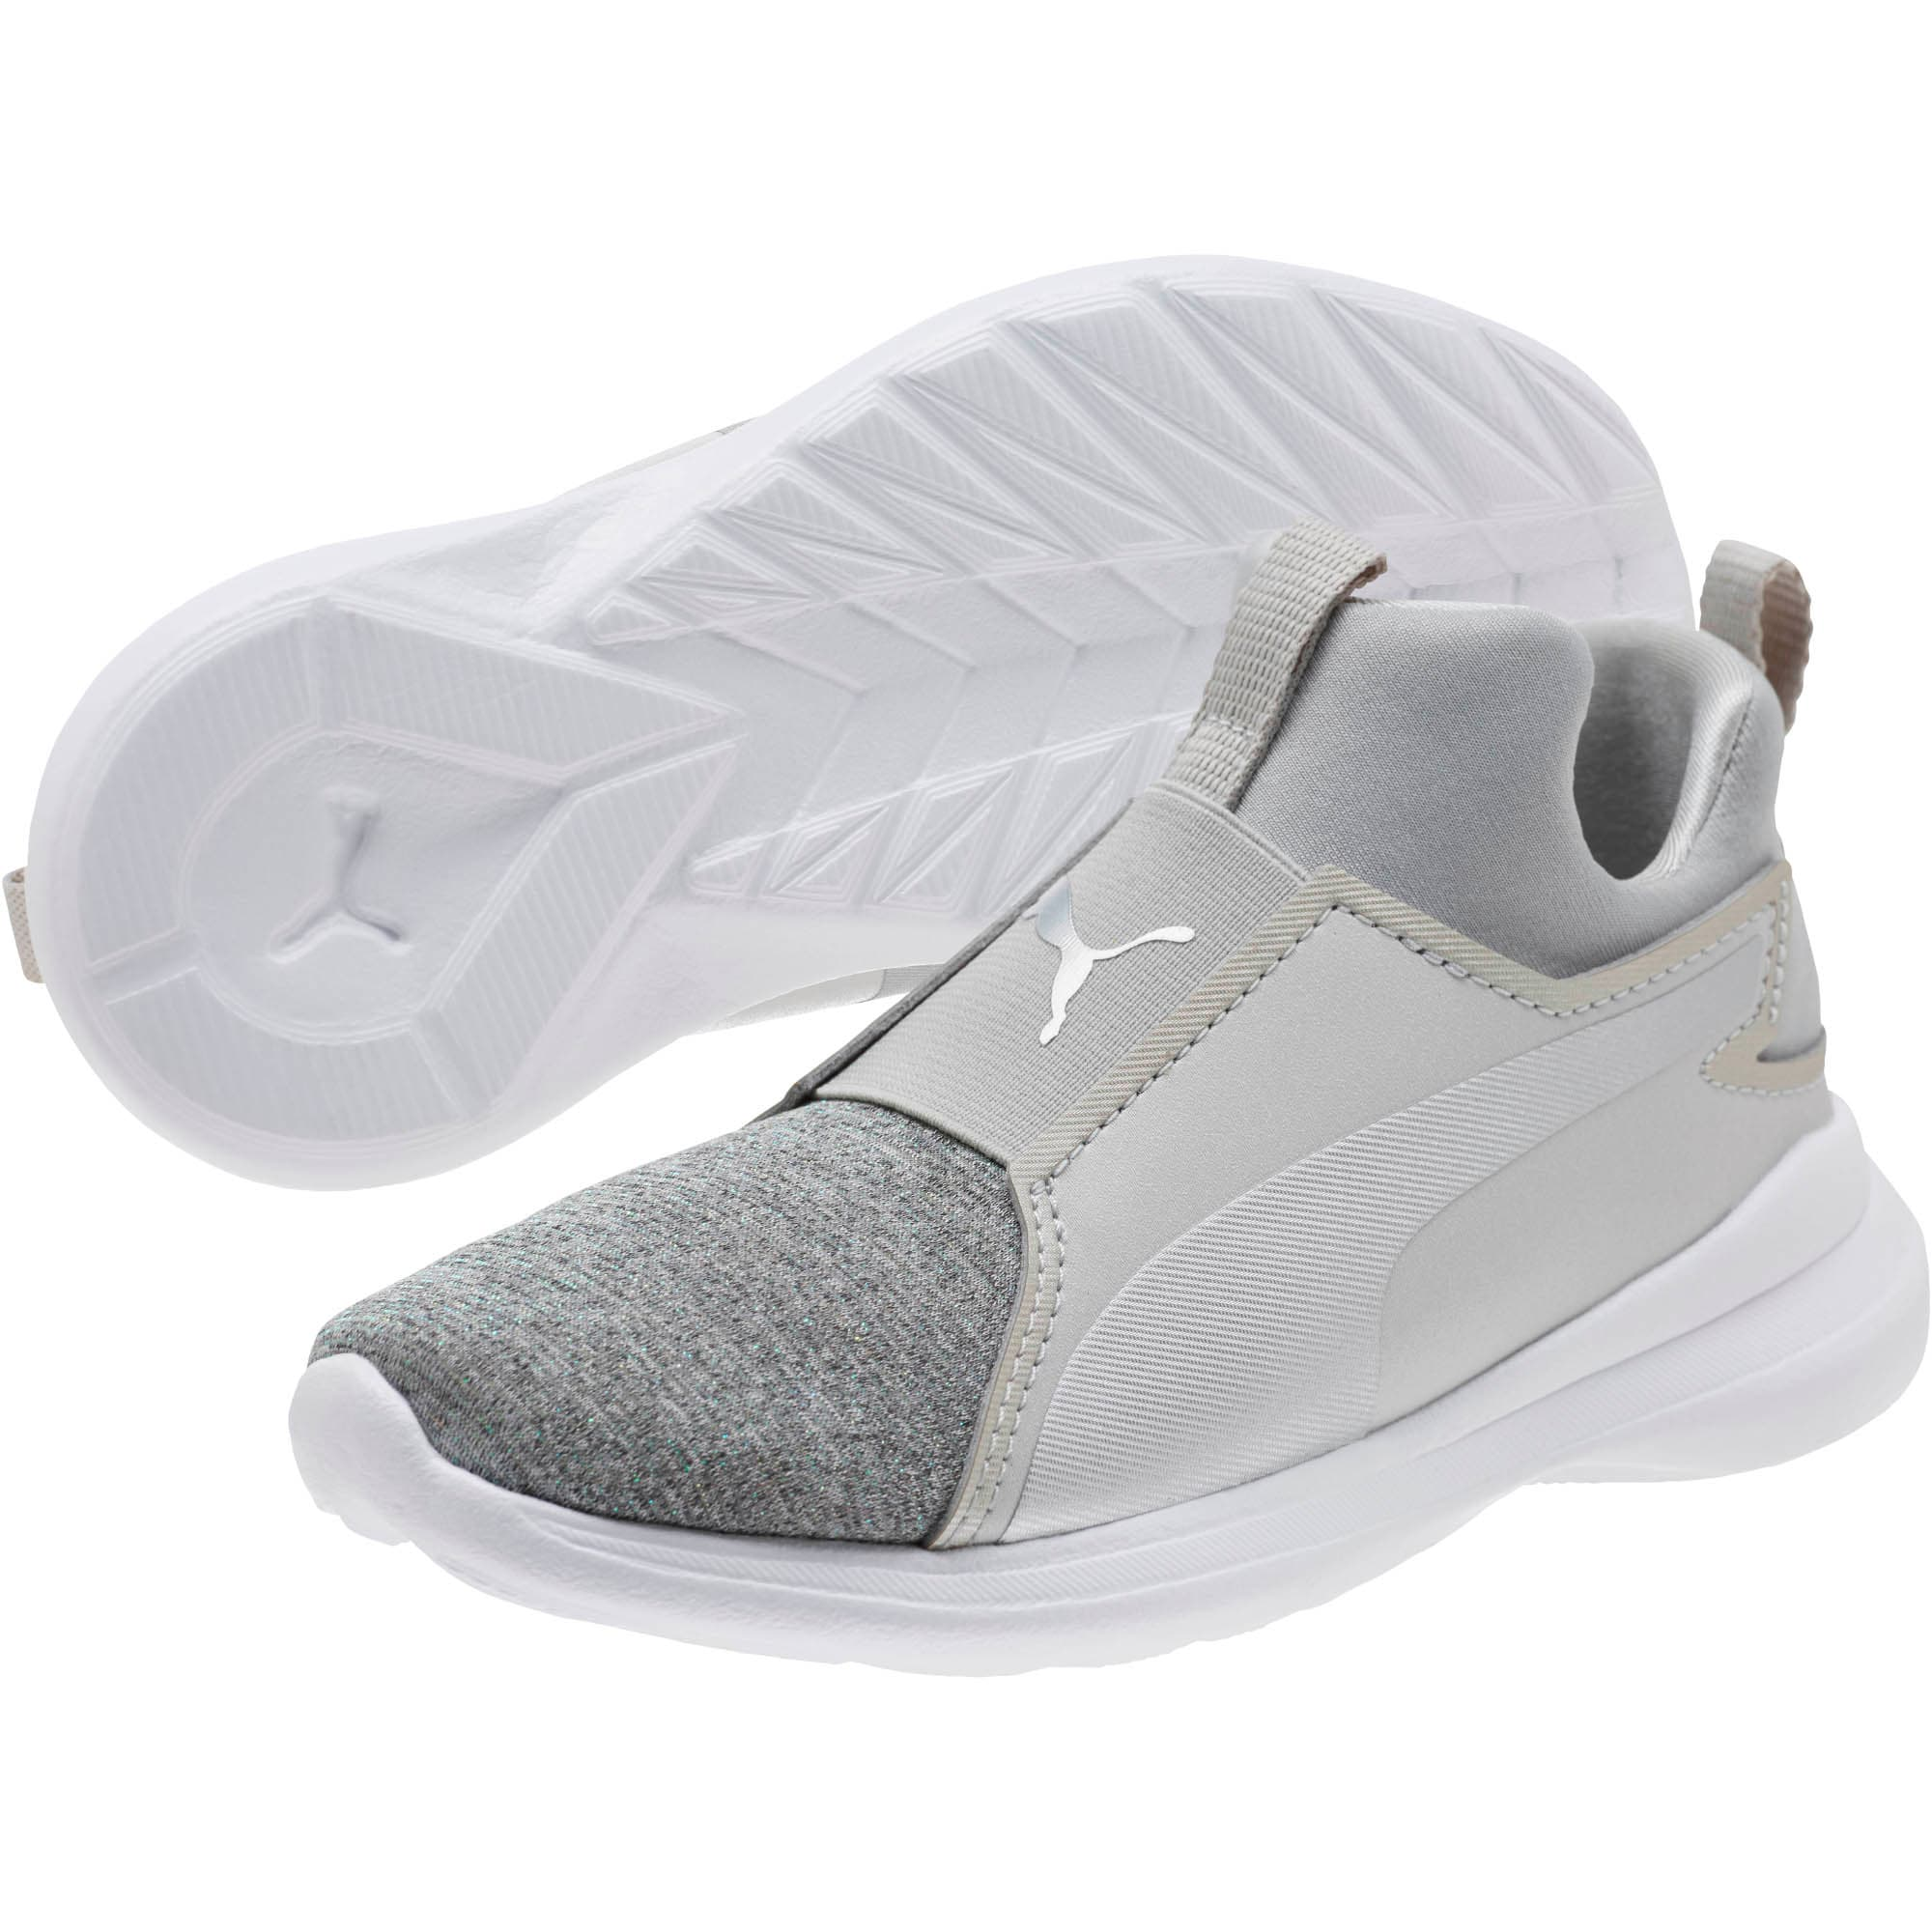 Thumbnail 2 of Puma Rebel Mid Glow Little Kids' Shoes, Gray Violet-Puma Silver, medium